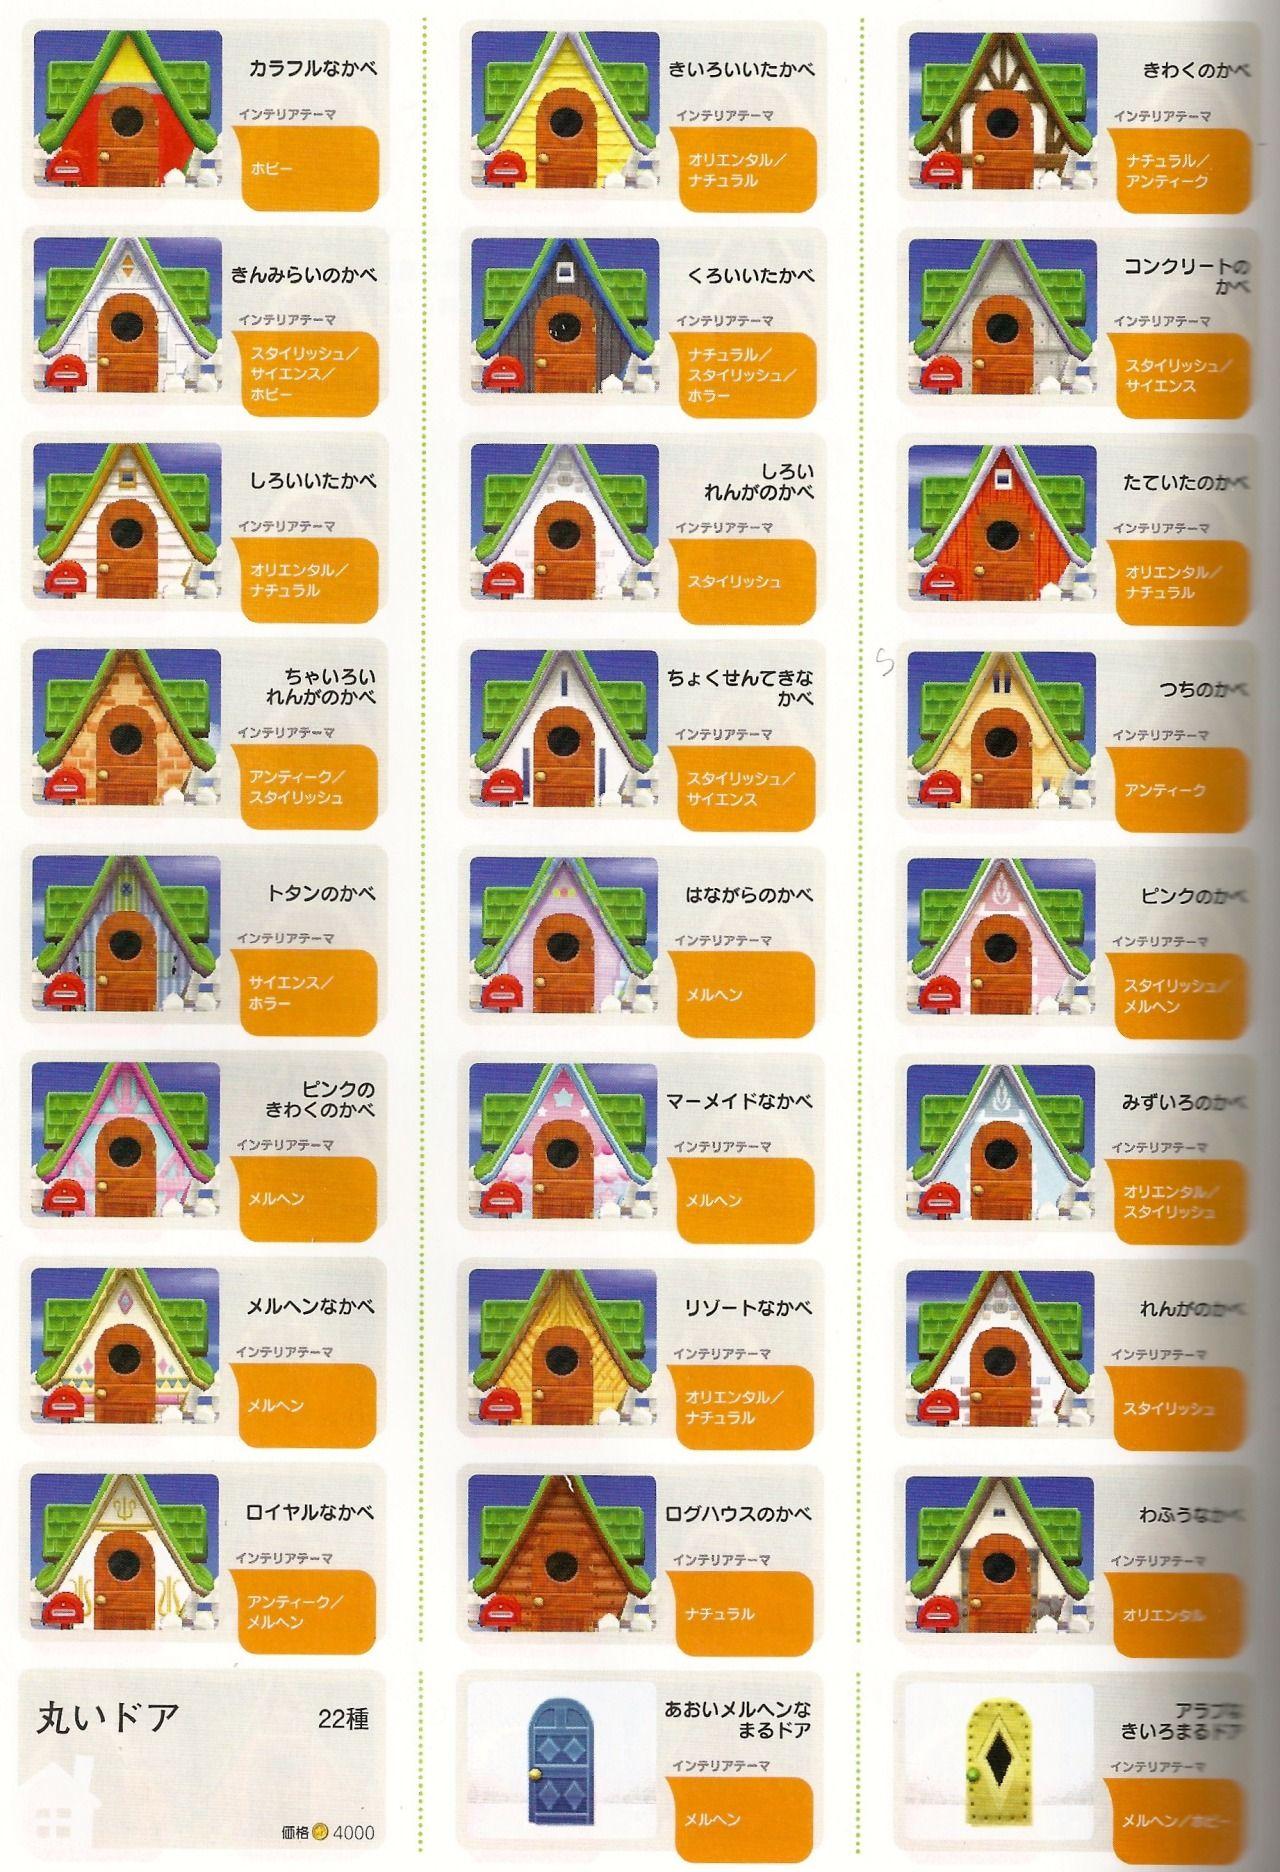 Comfort Crossing Weeradish Animal Crossing New Leaf House Animal Crossing Guide Animal Crossing New Leaf